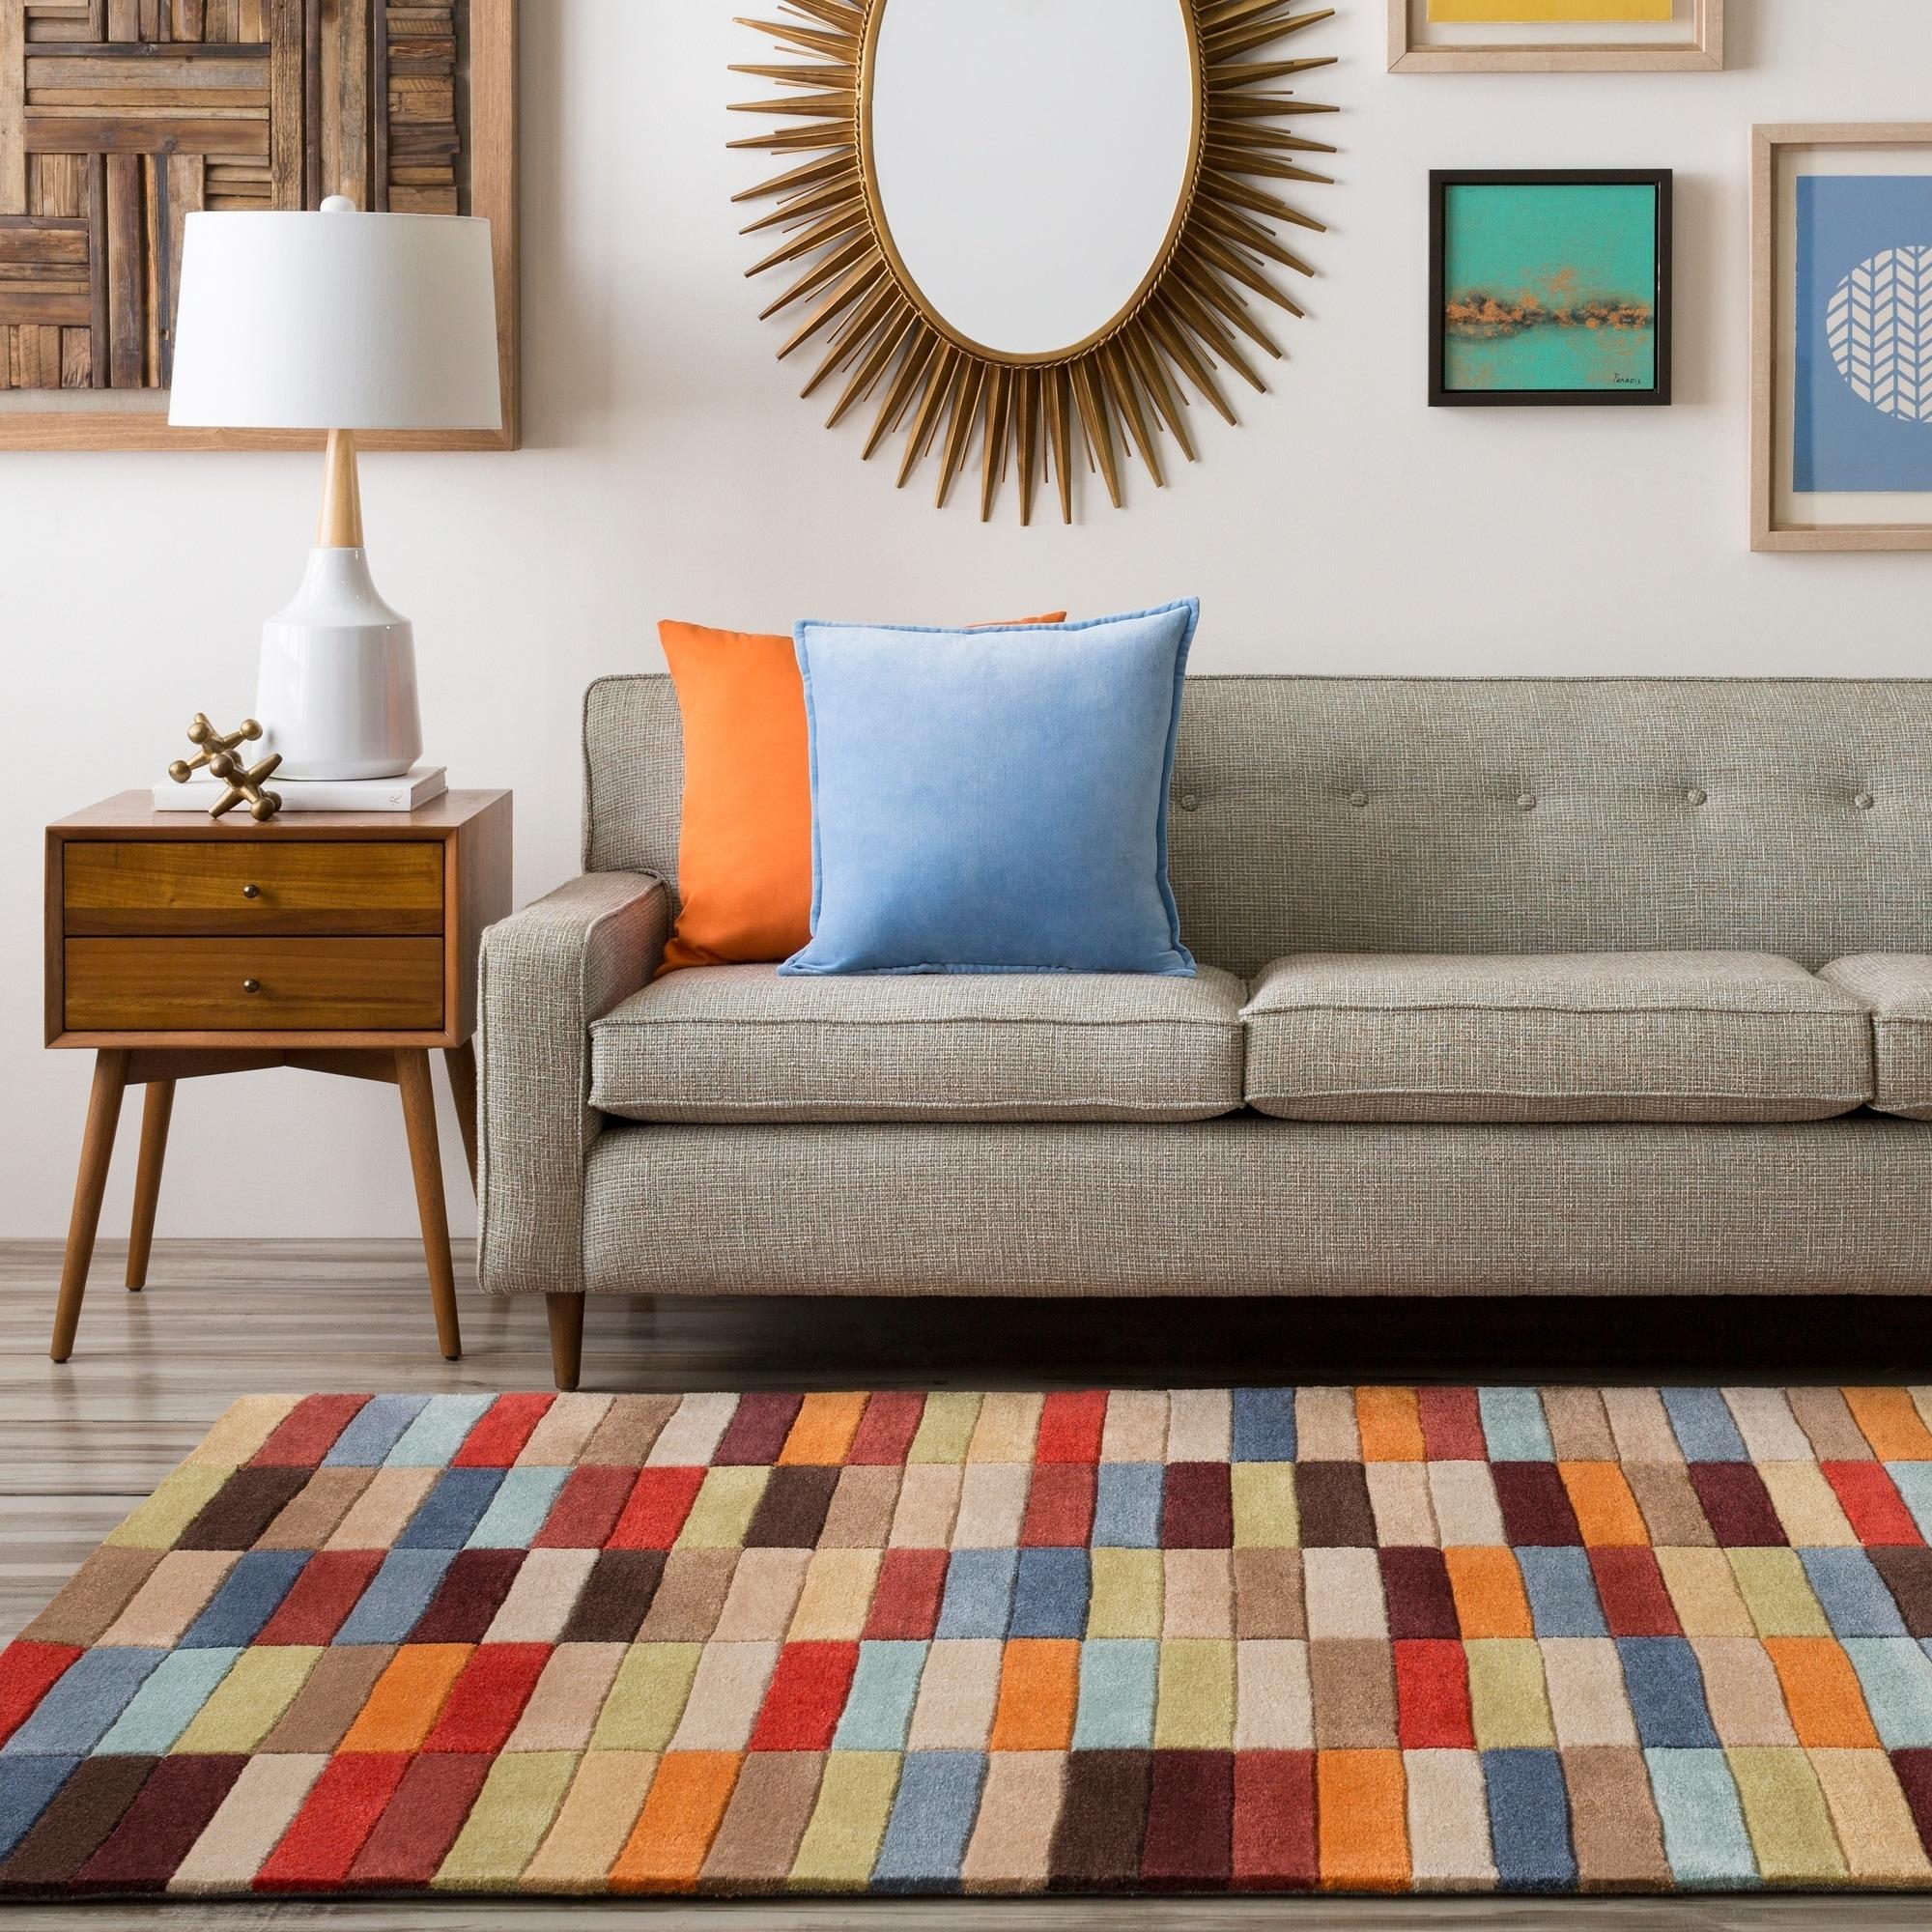 Hand tufted troy multicolor geometric area rug 9 x 13 9 x 13 bronze